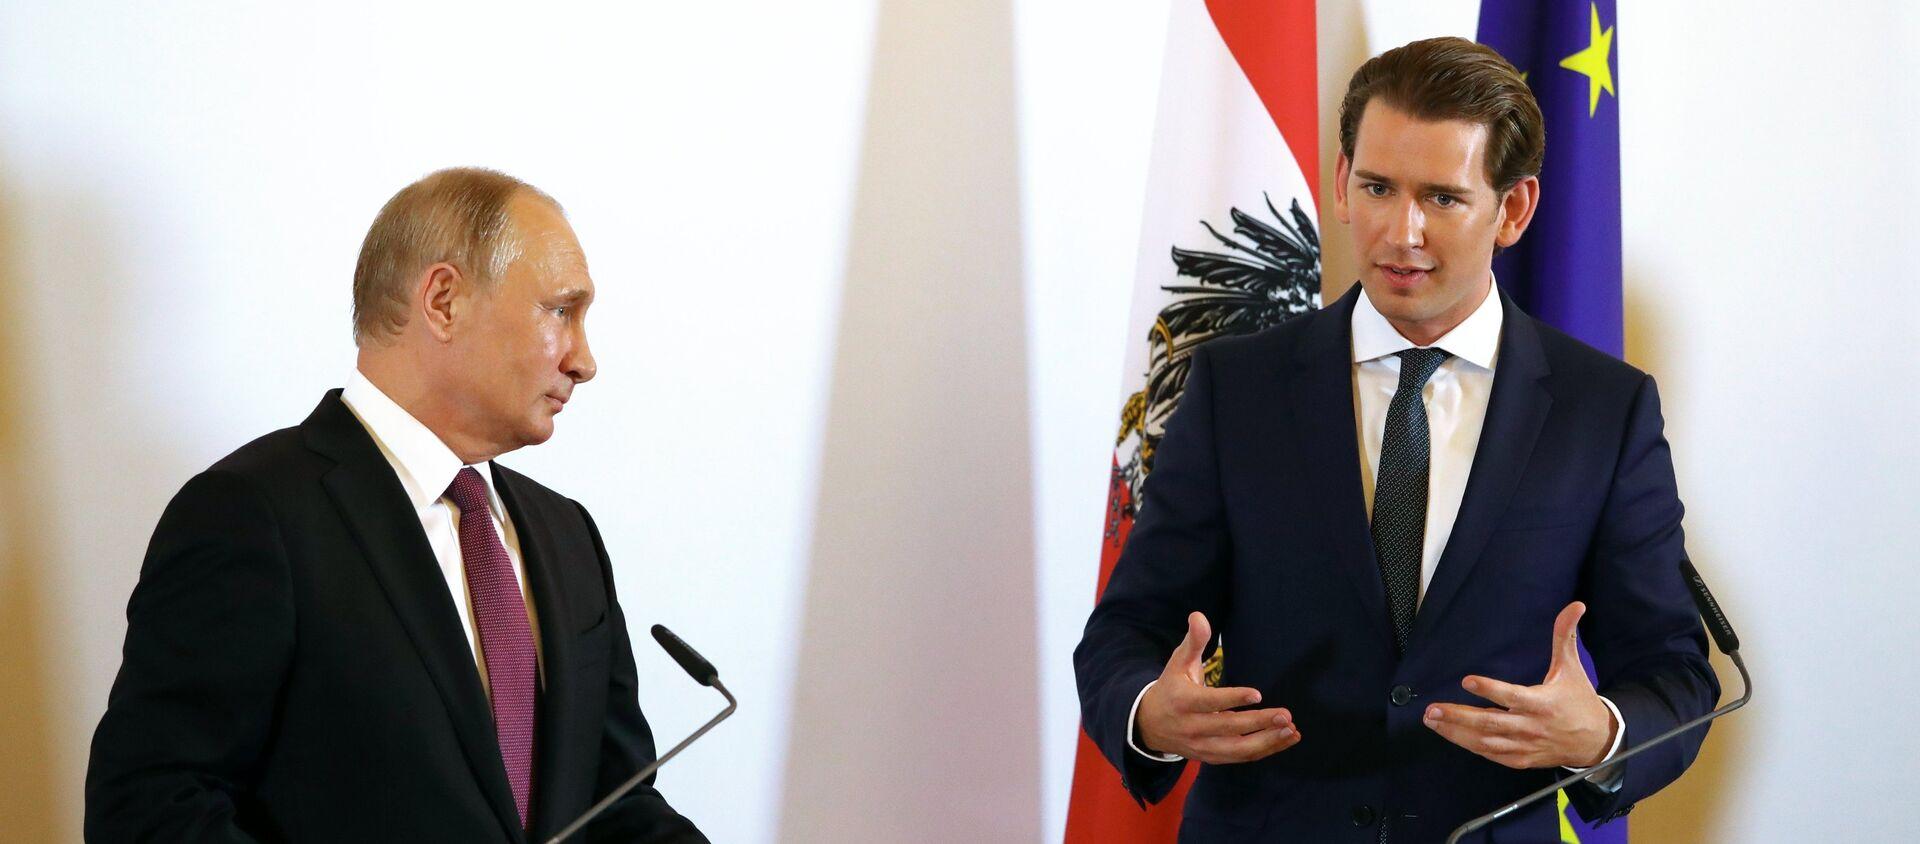 Sebastian Kurz i Władimir Putin - Sputnik Polska, 1920, 07.04.2021